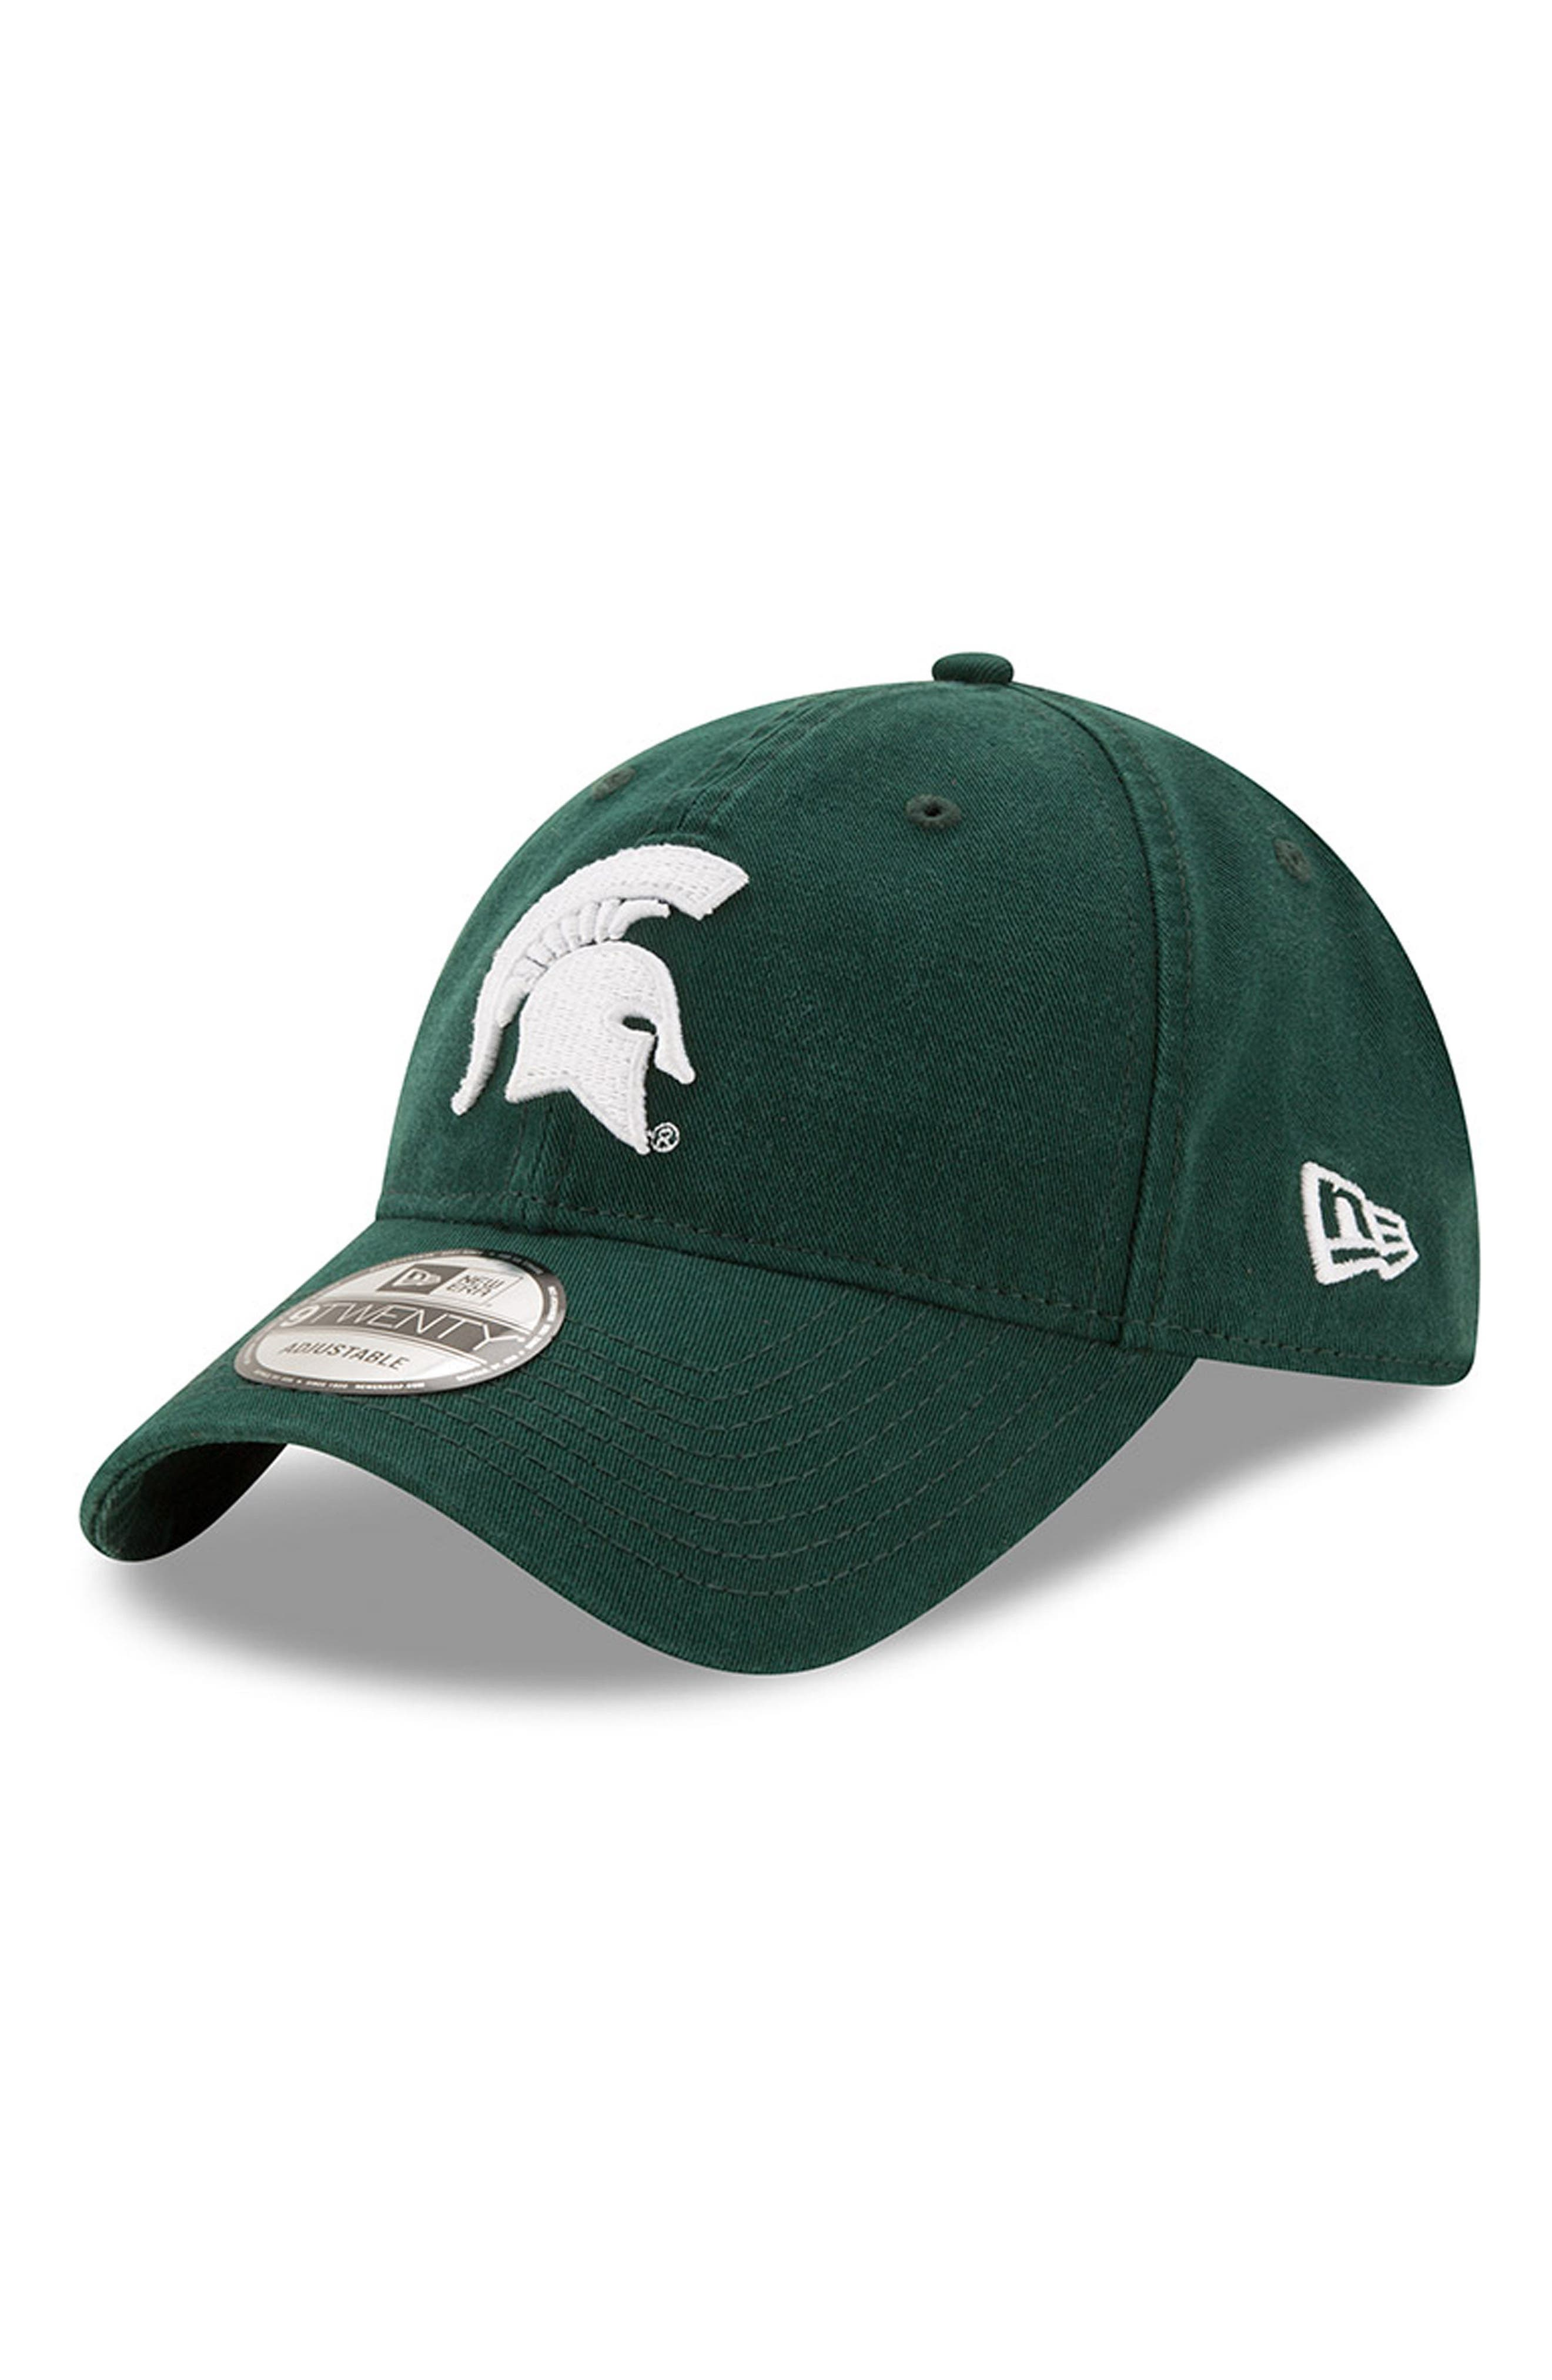 New Era Collegiate Core Classic - Michigan State Spartans Baseball Cap,                             Main thumbnail 1, color,                             301